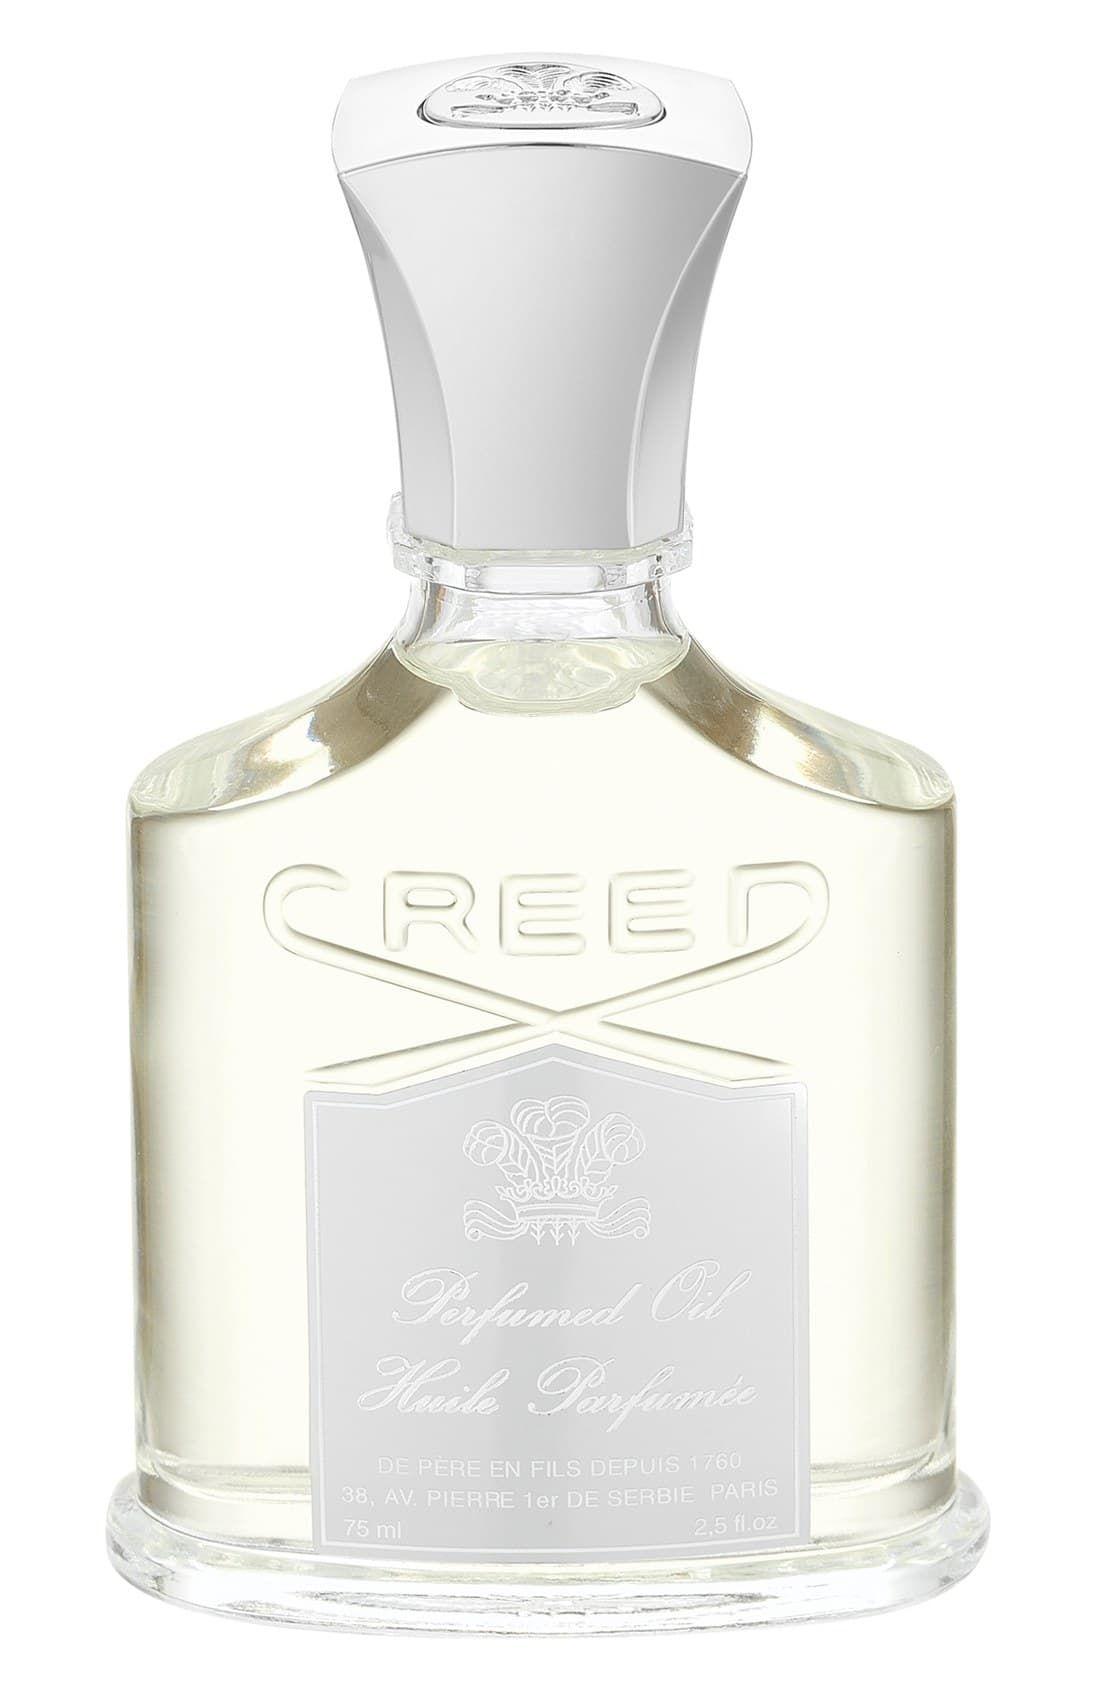 Creed Silver Mountain Water Perfume Oil Spray With Images Flower Perfume Perfume Oils Creed Perfume